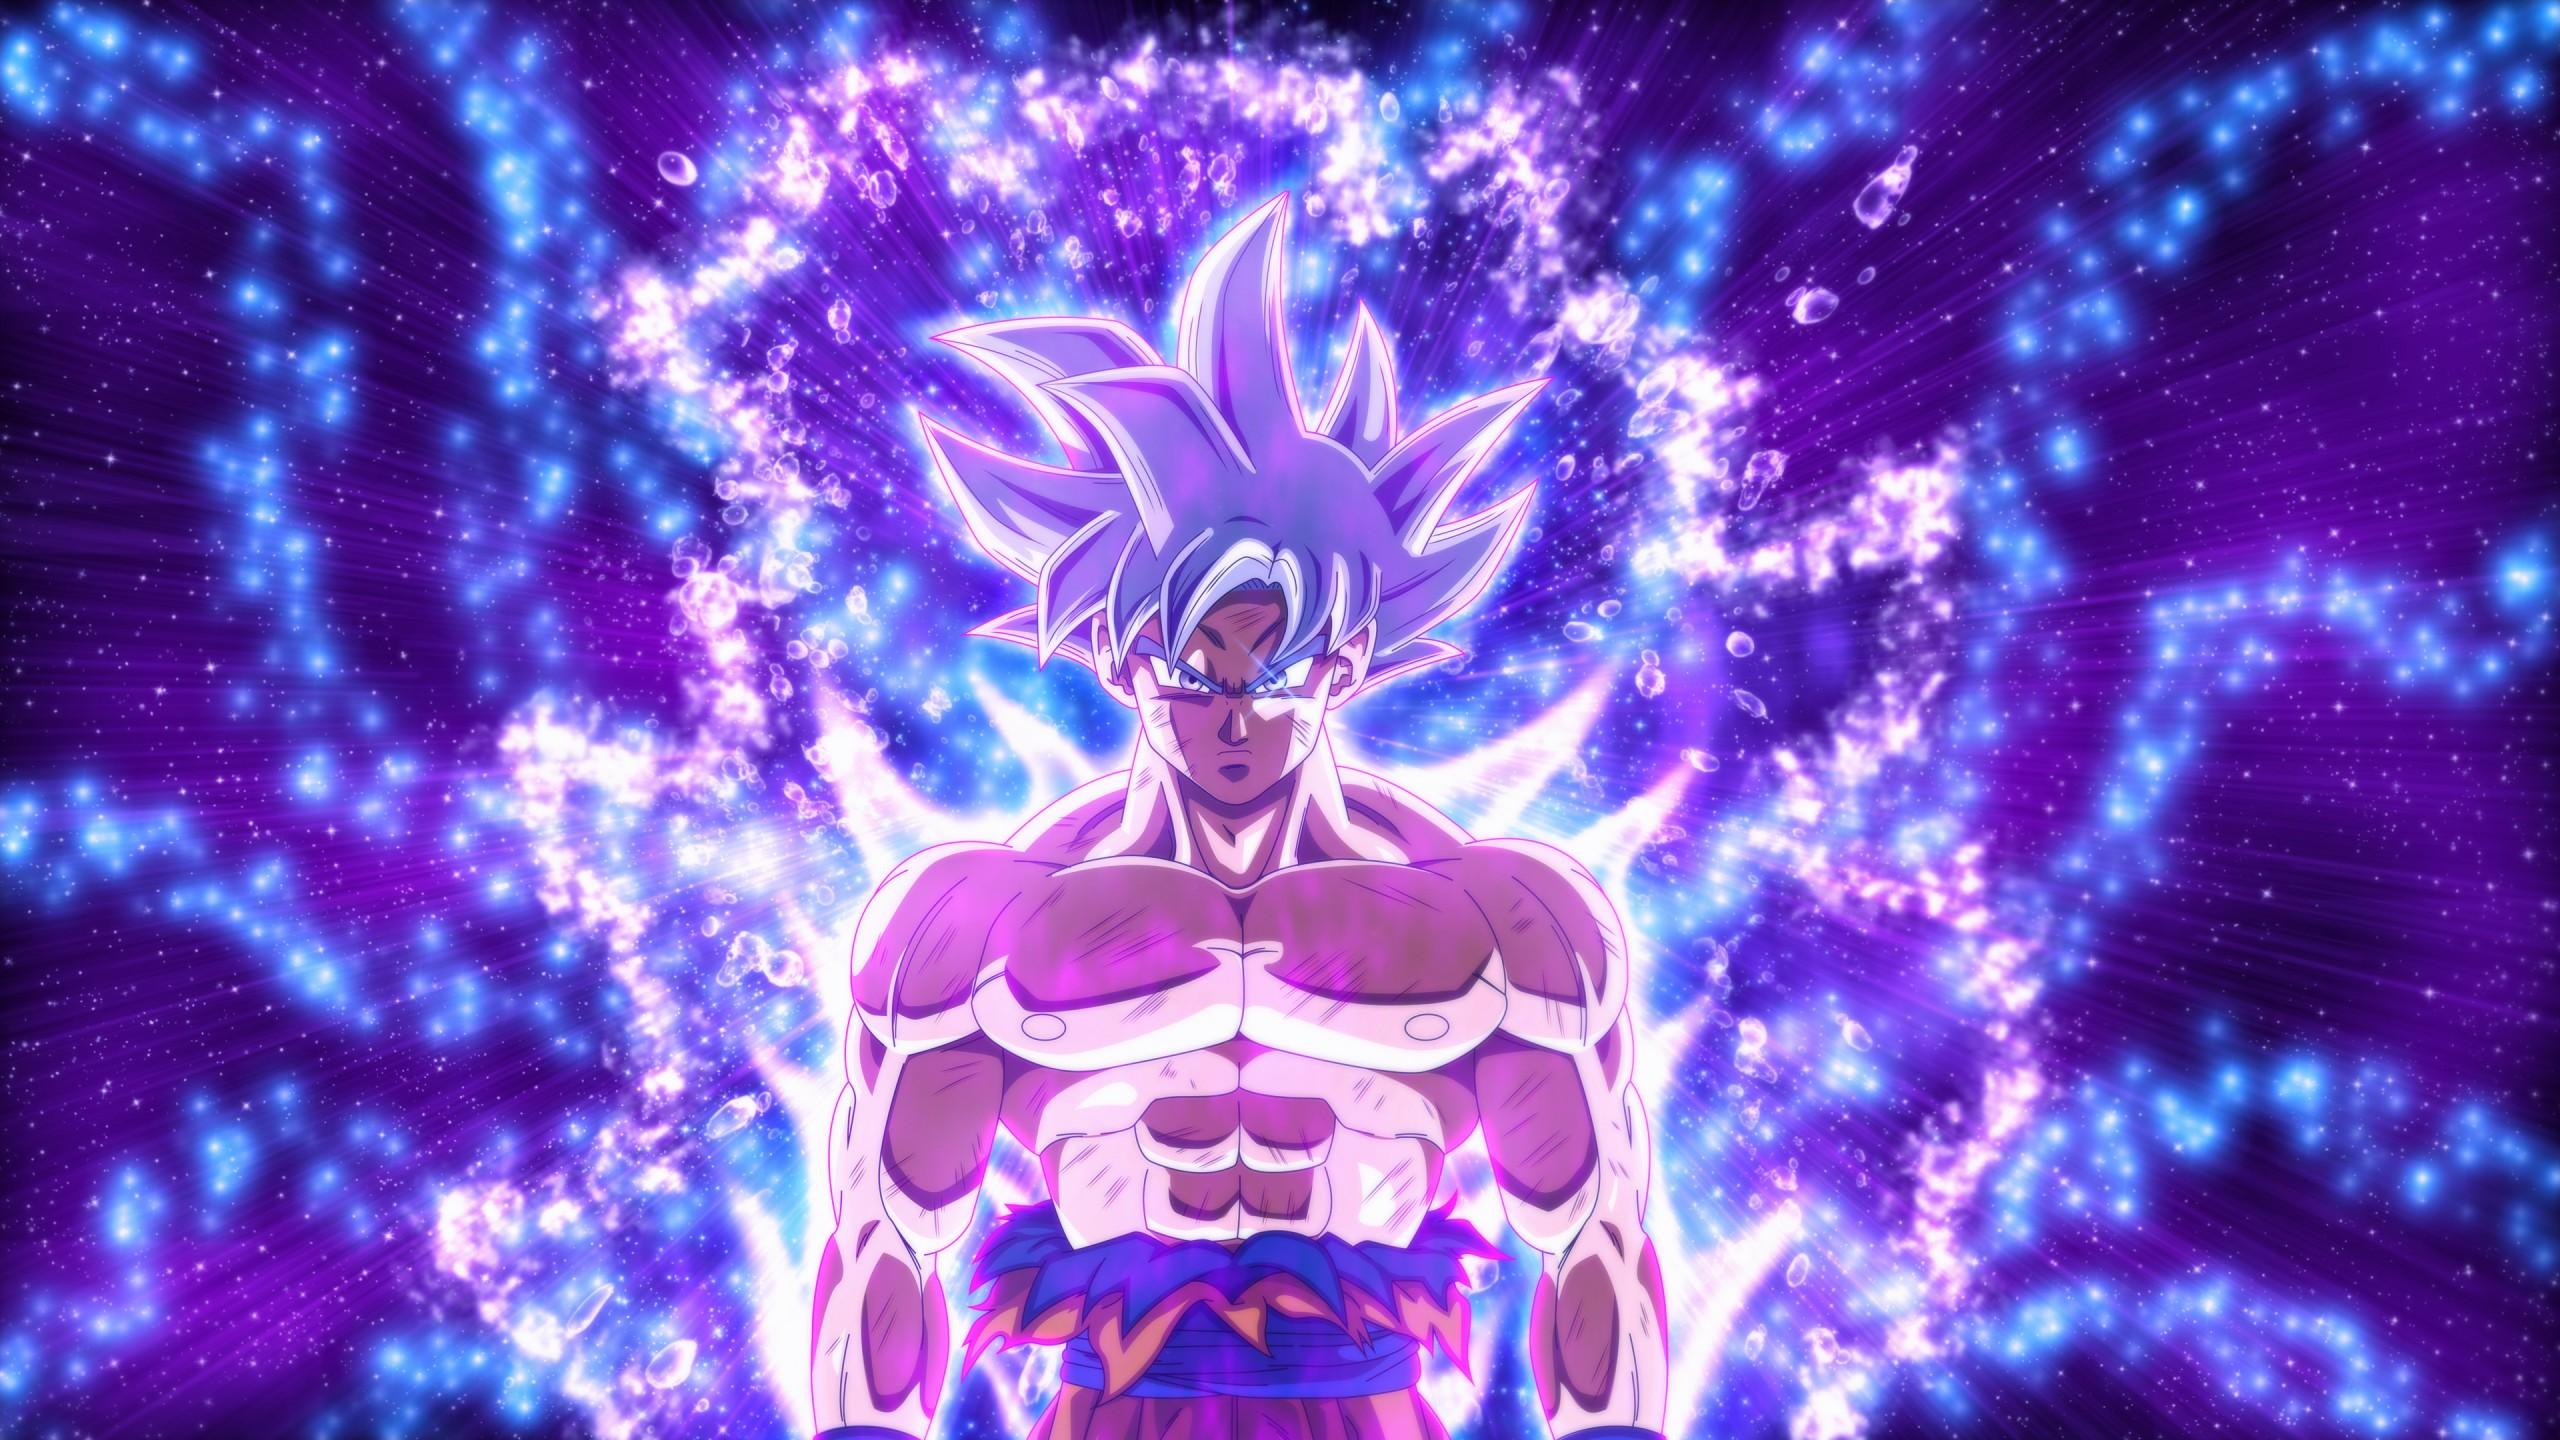 Naruto Wallpaper Hd Iphone 6 Dragon Ball Super Goku Ultra Instinct 4k Wallpapers Hd